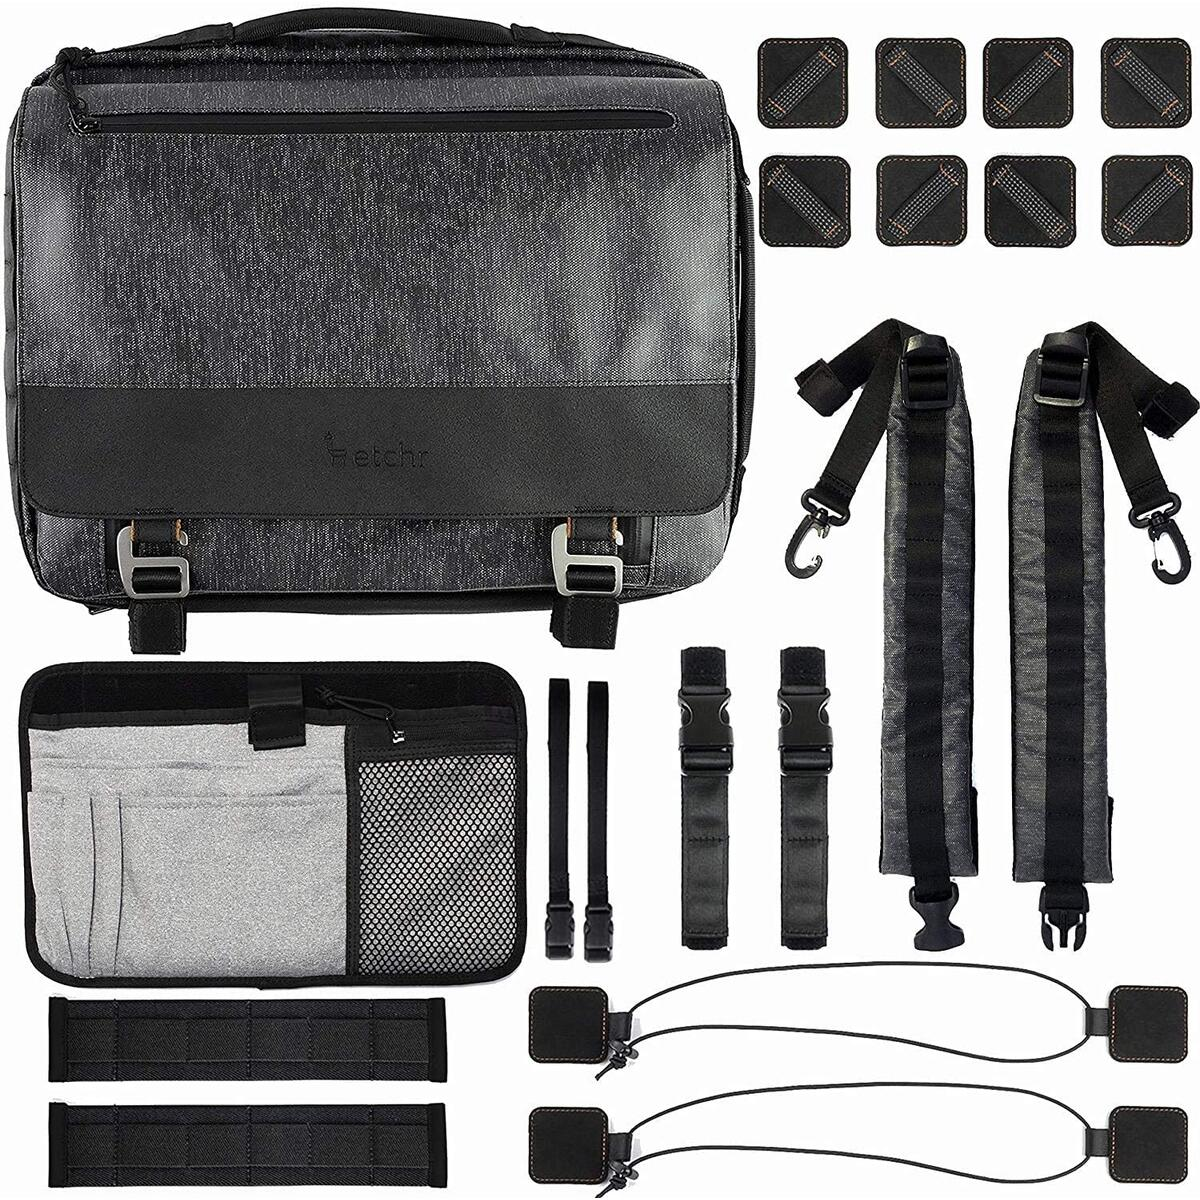 ETCHR Art Satchel - Artist Messenger Bag for Art on the Go - Professional Tripod Mountable Art Bag for Supplies - Multi Functional Weatherproof and Vegan-Friendly Travel Artist Bag for Tool Management